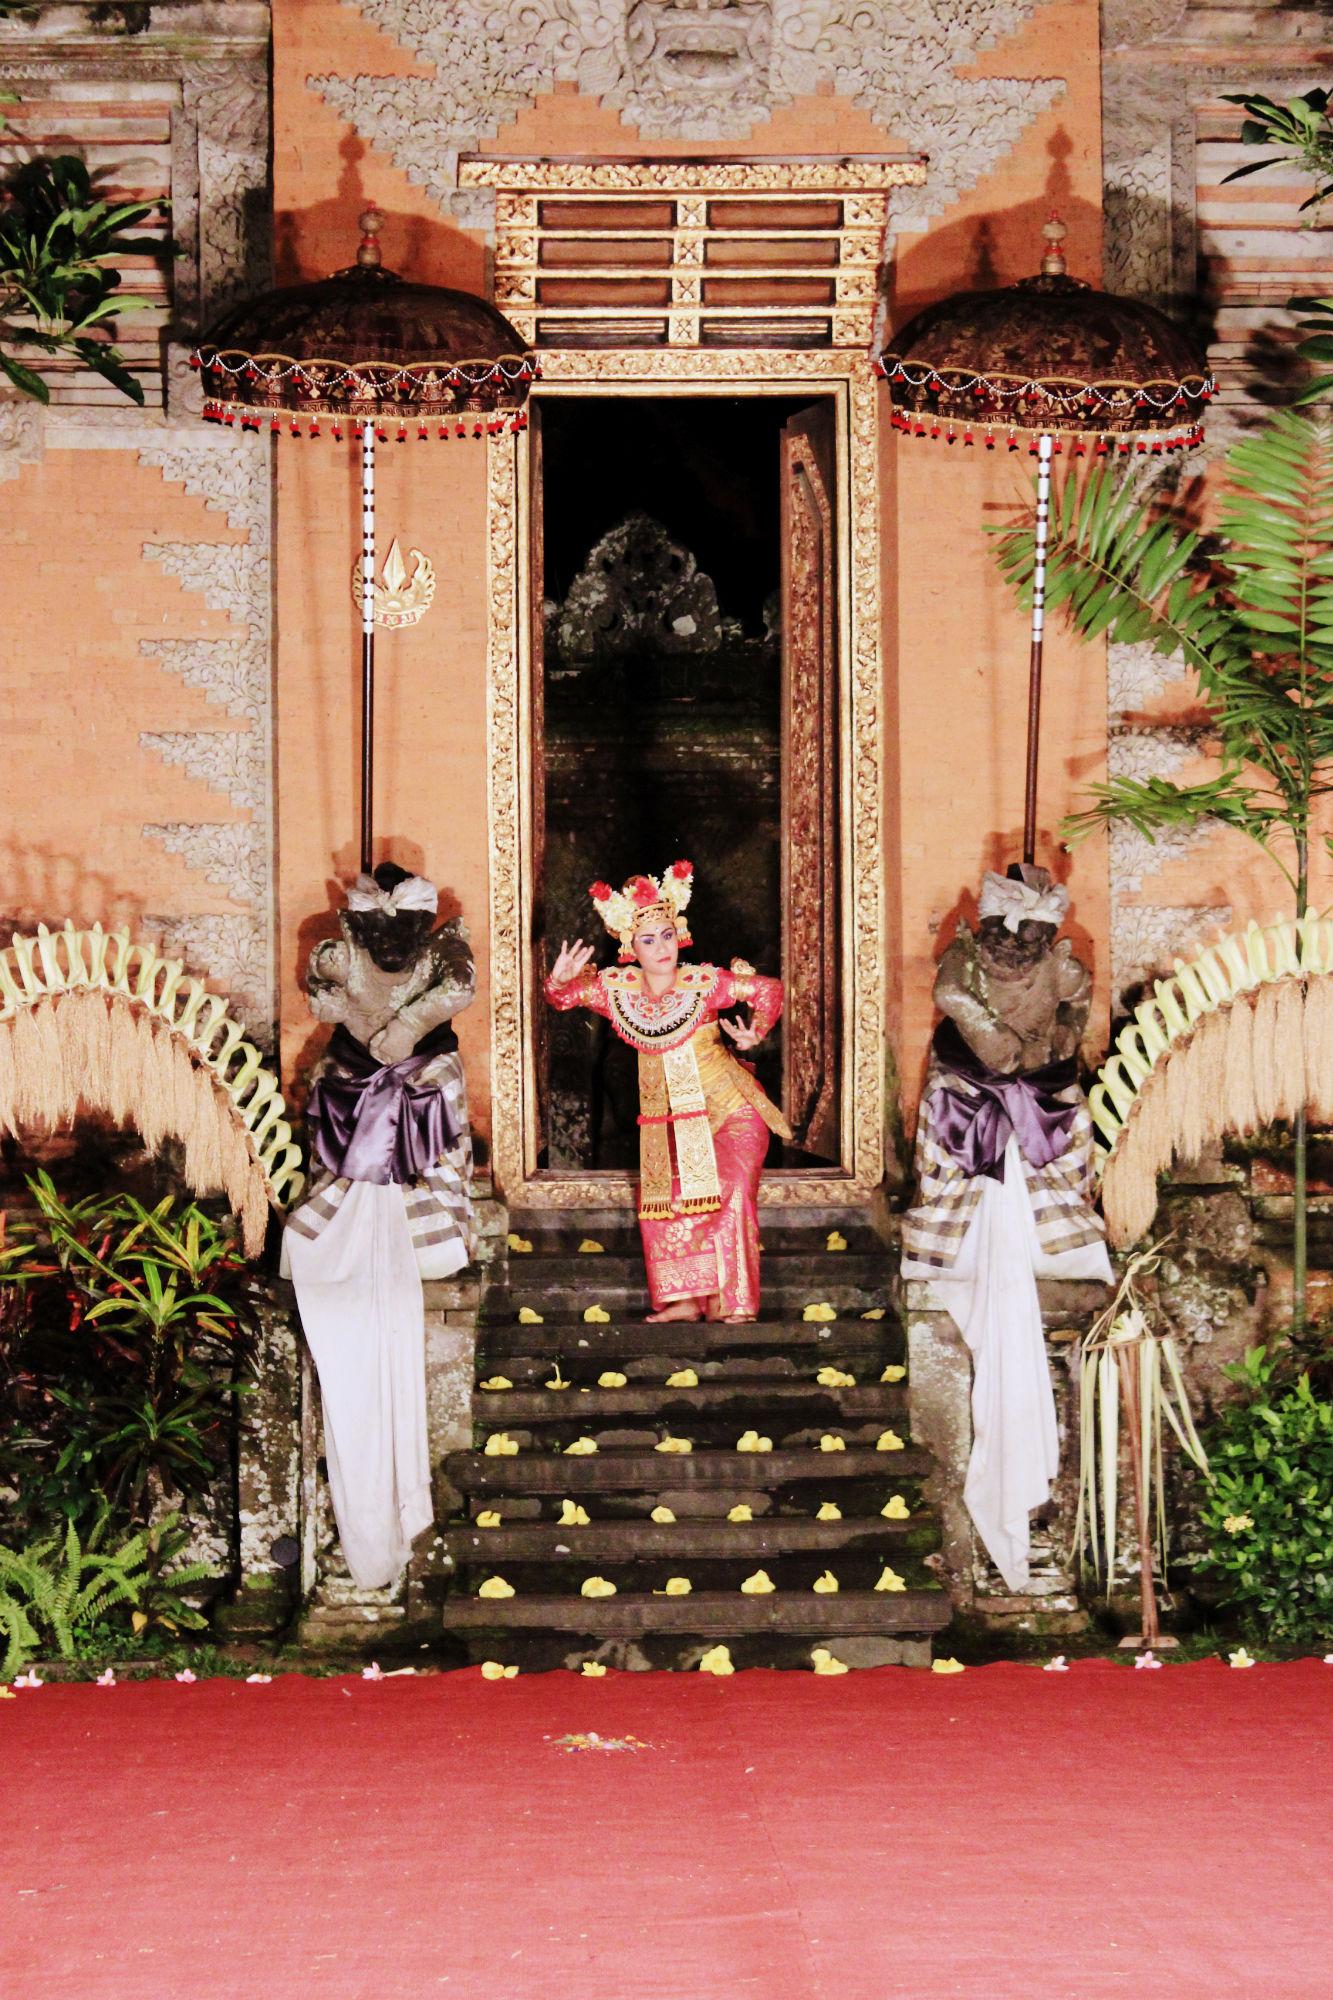 Балийский народный танец